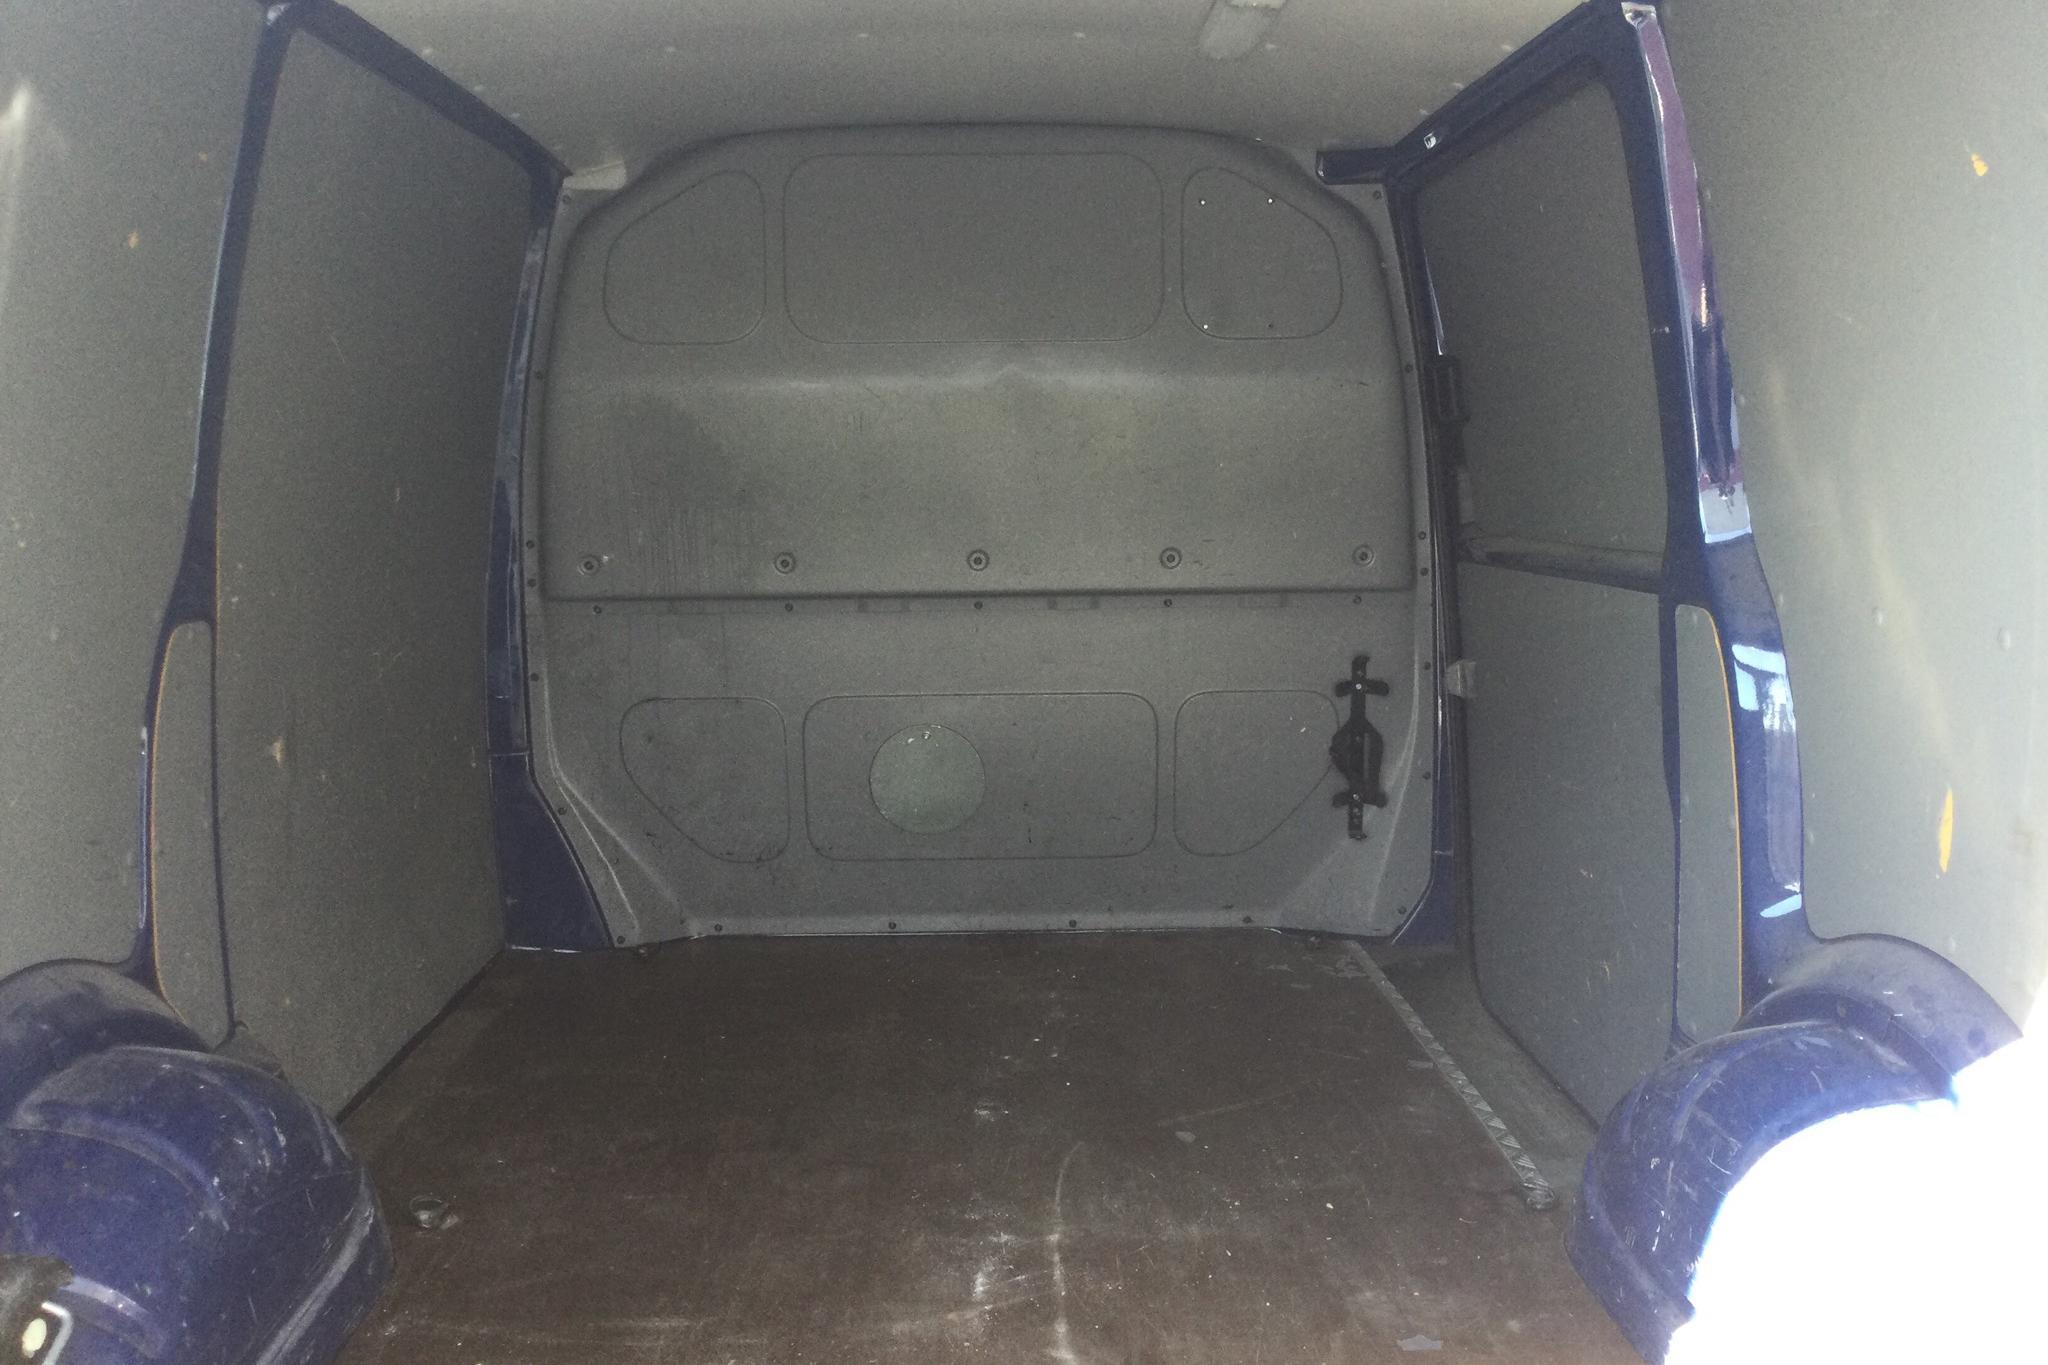 VW Transporter T5 2.5 TDI (130hk) - 12 388 mil - Manuell - Dark Blue - 2004